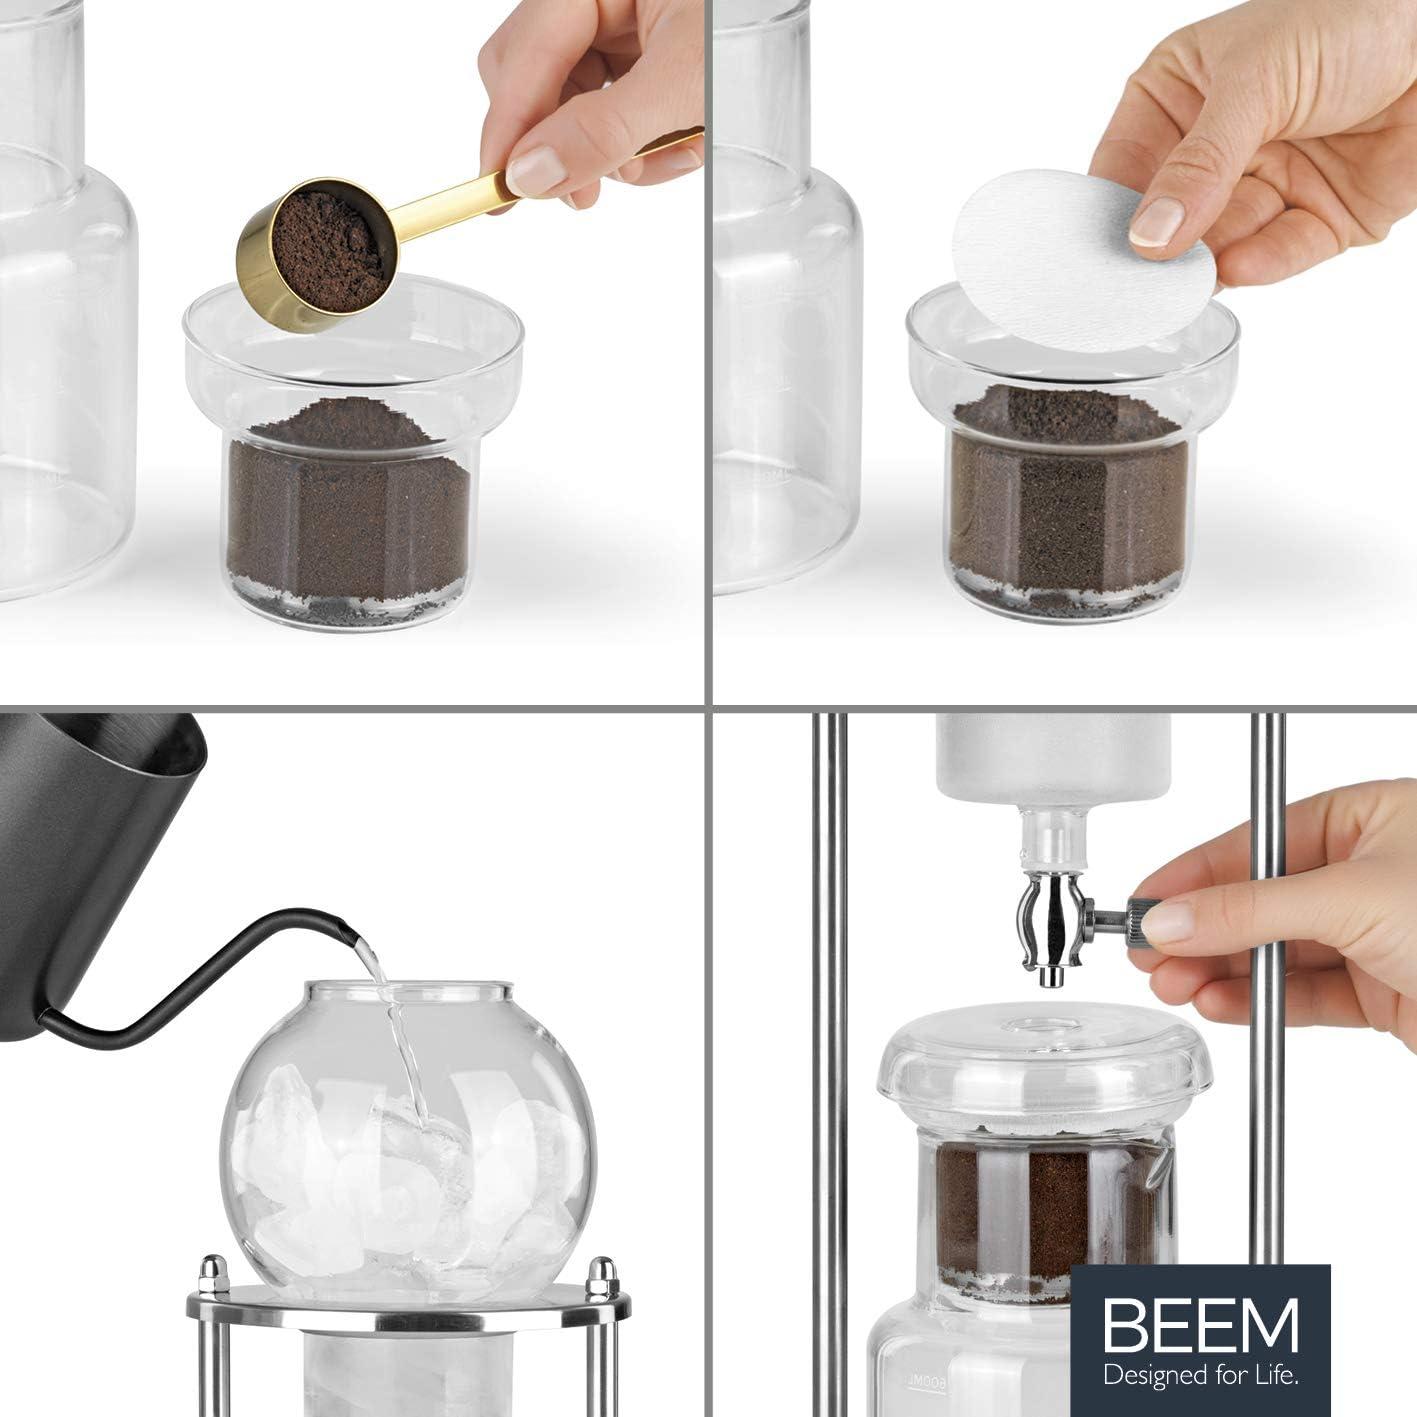 Cafetera de /émbolo 0,6 l, 11 piezas, jarra de cristal, doble filtro de acero inoxidable, Dripper ajustable Beem Cold Drip